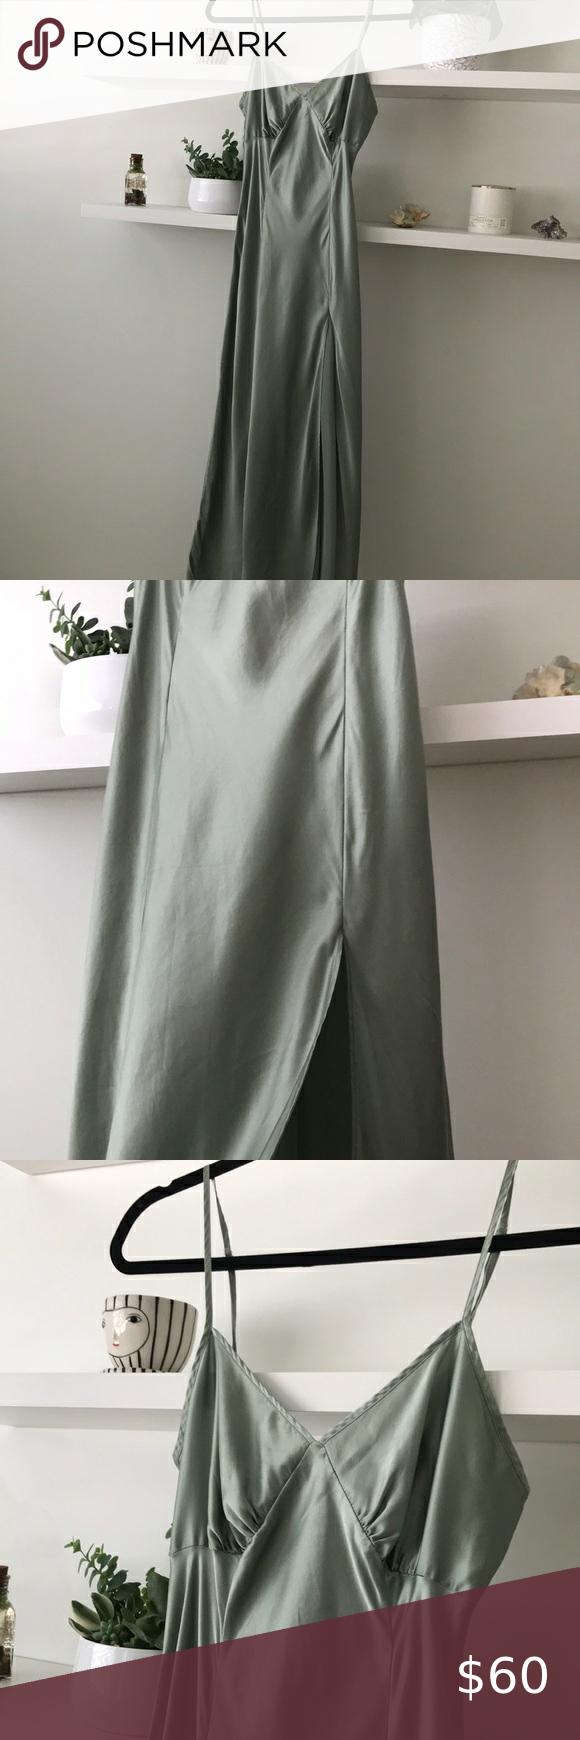 Victoria S Secret 100 Silk Slip Gown Maxi Dress S Maxi Gown Dress Silk Slip Maxi Slip Dress [ 1740 x 580 Pixel ]